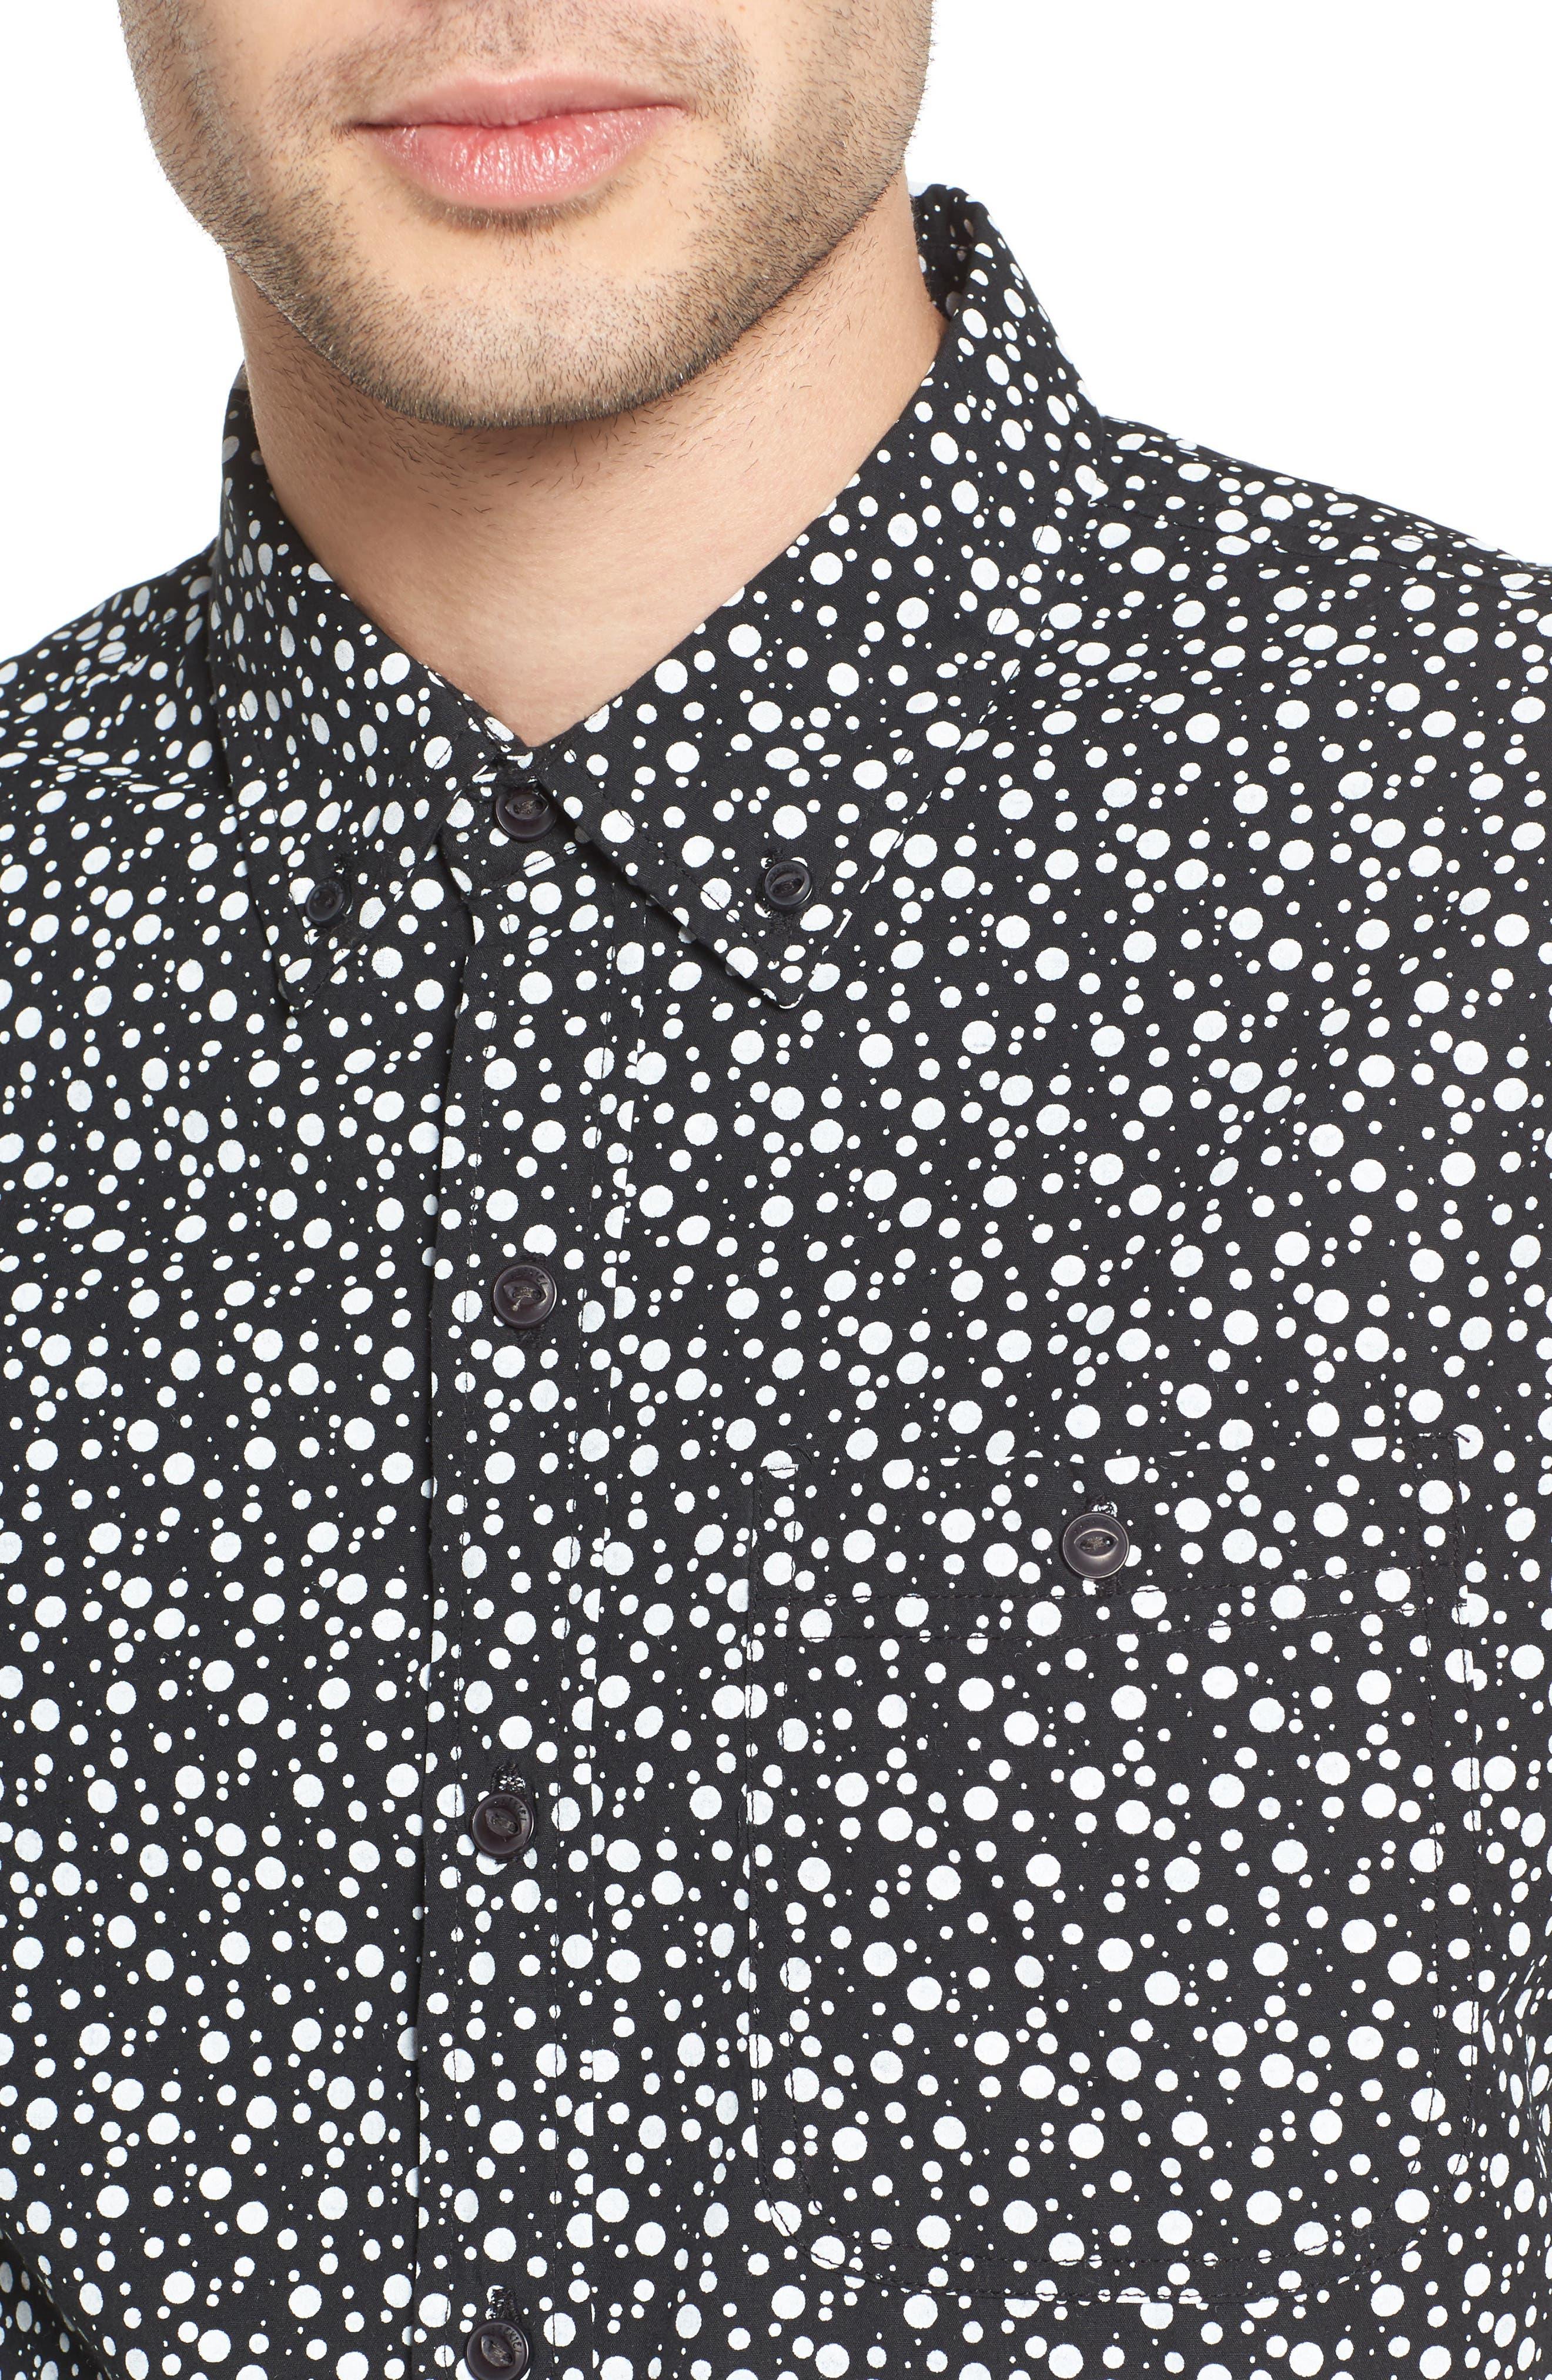 Alternate Image 4  - Ezekiel Bubble Print Woven Shirt